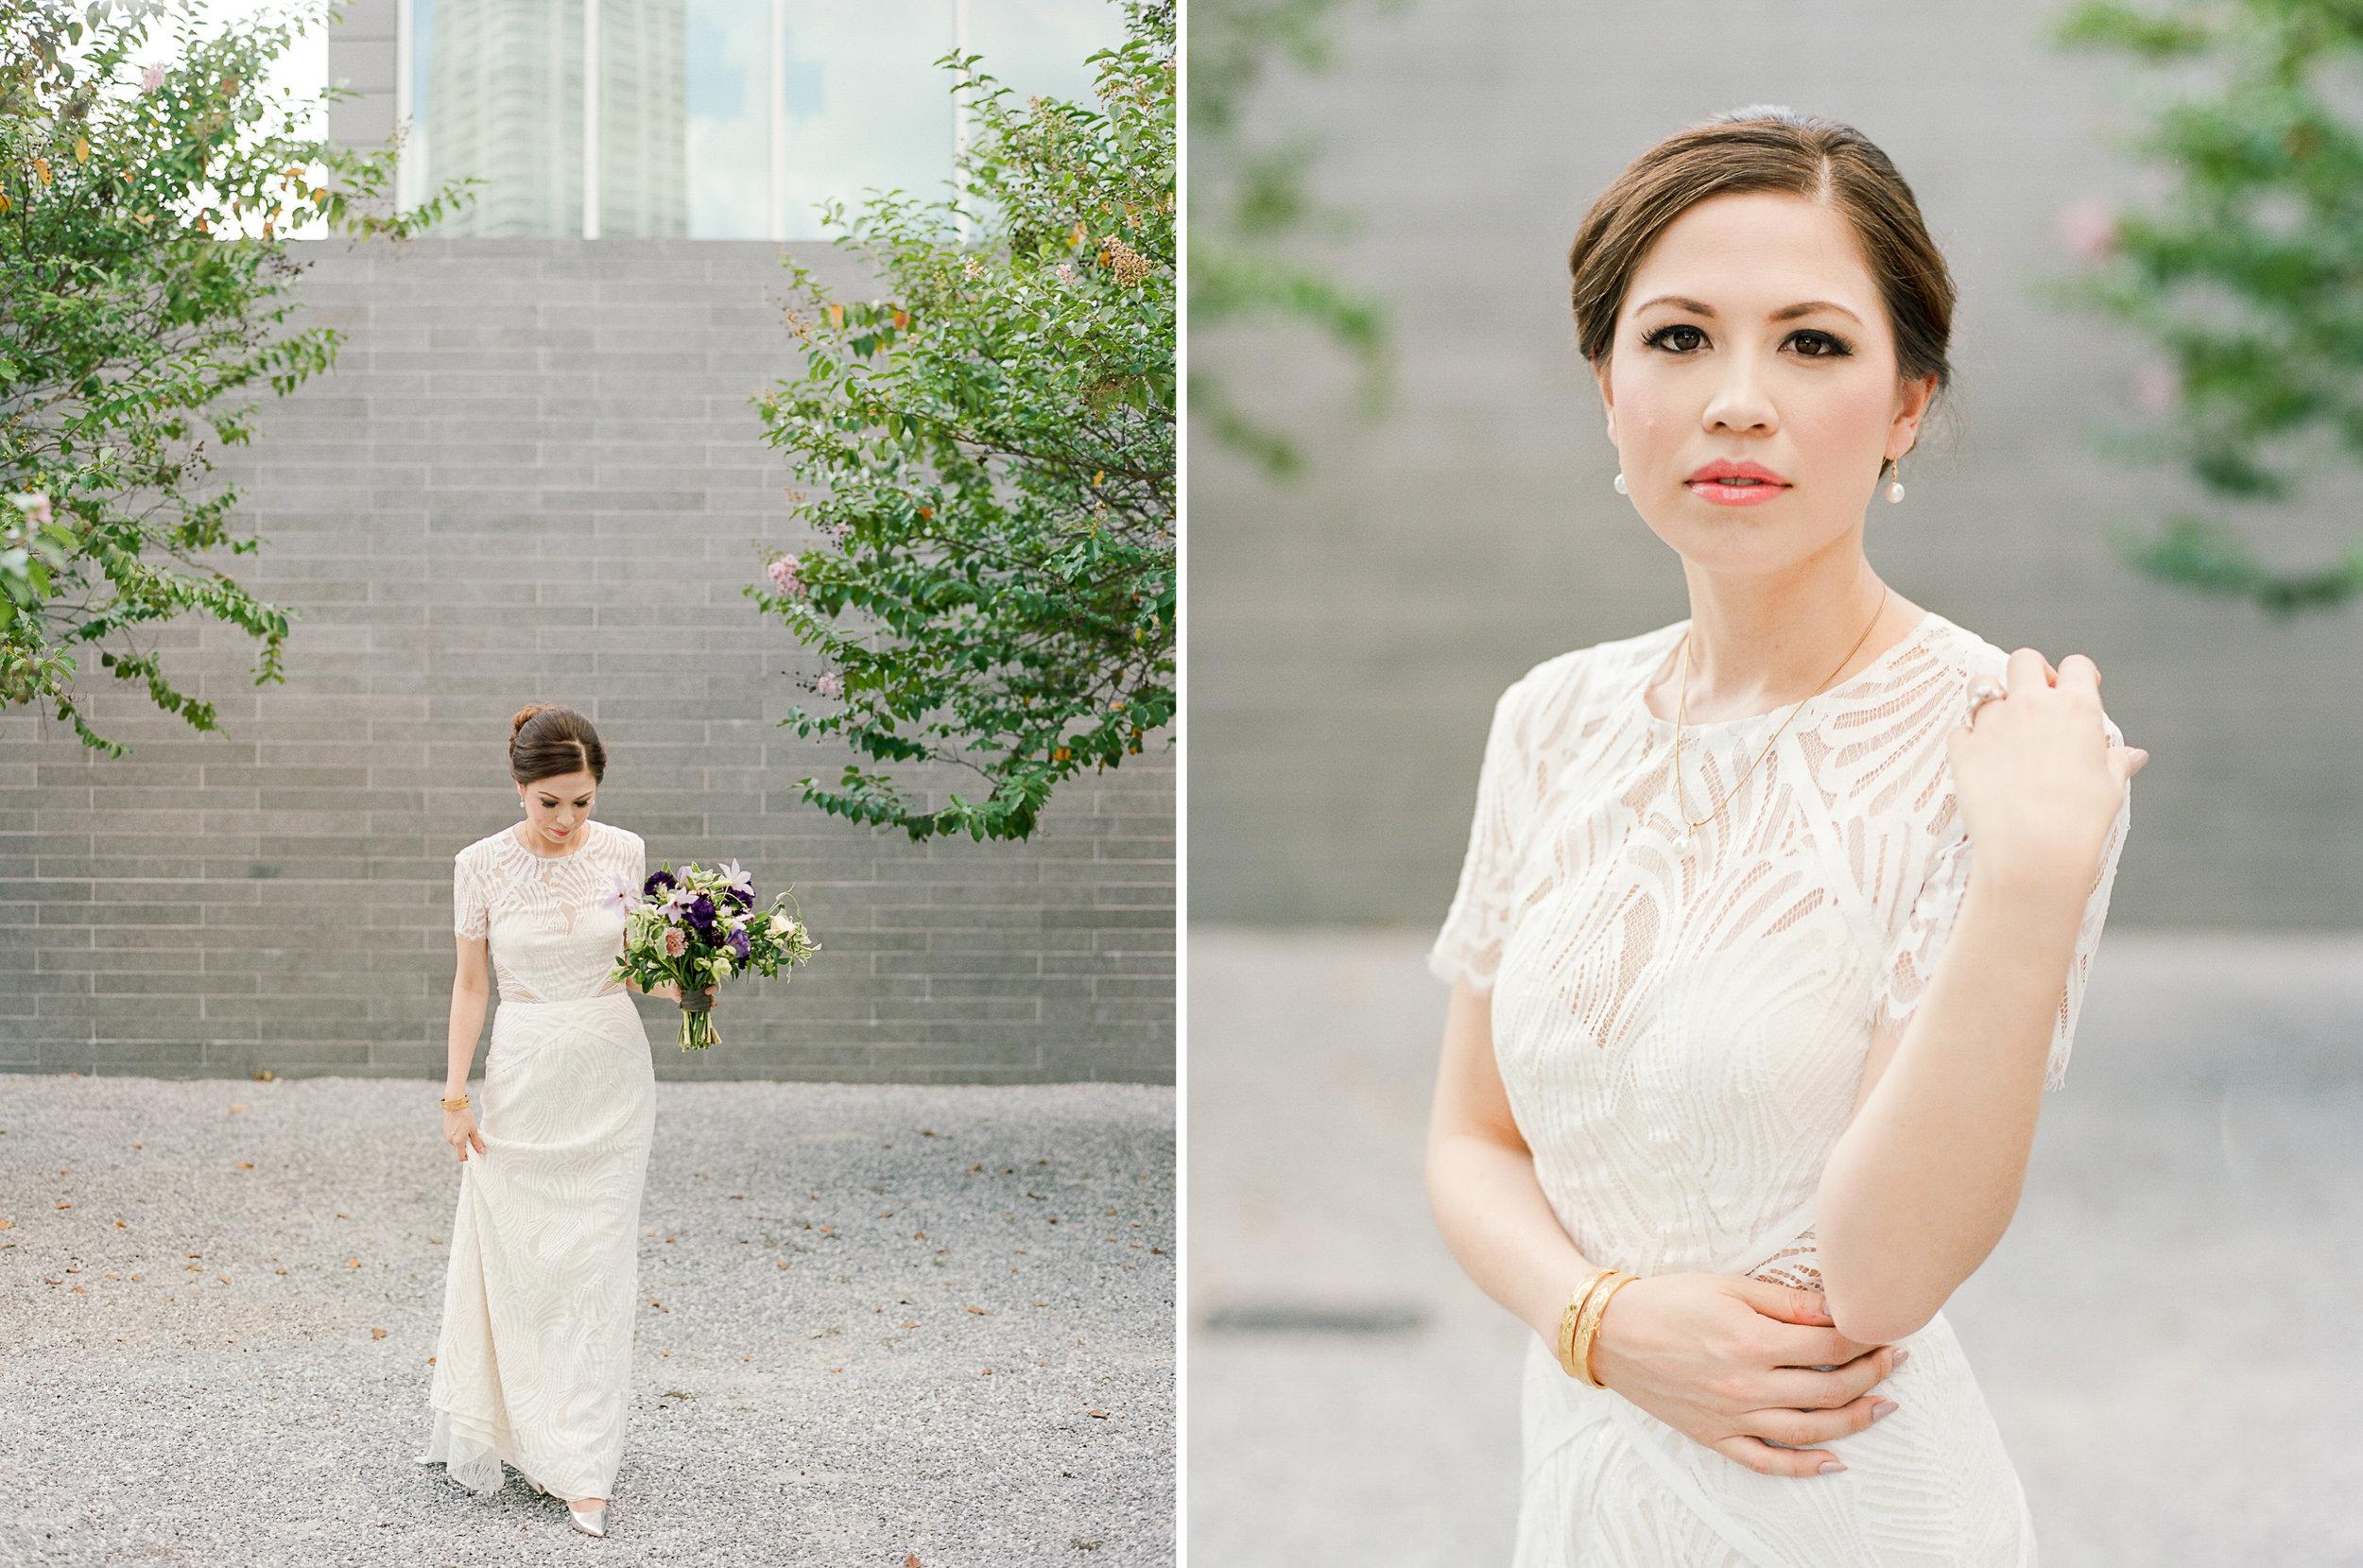 mcgovern-centennial-gardens-wedding-houston-wedding-photographer-bridals-film-austin-wedding-photographer-107.jpg